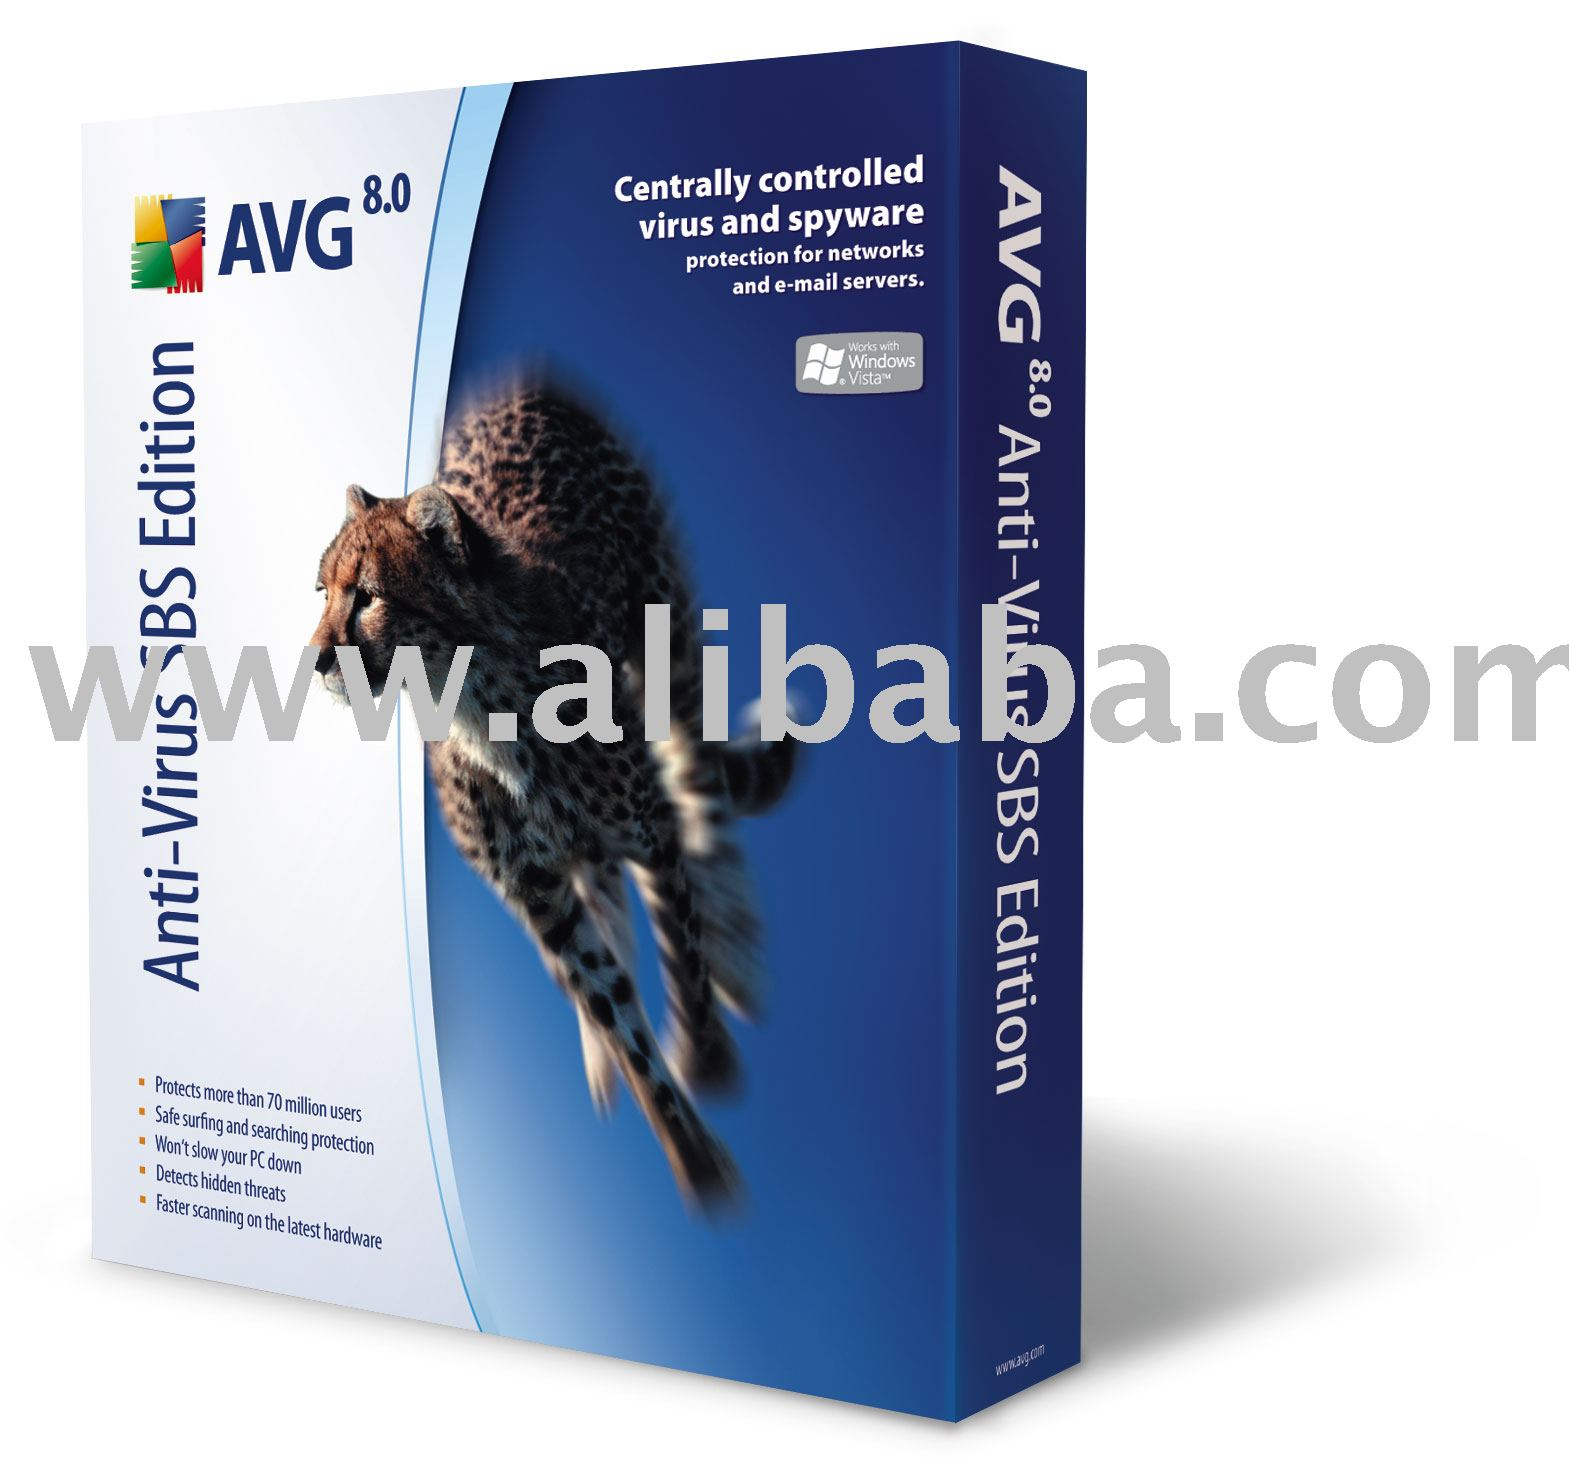 Avg Anti-virus Sbs (small Business Server) Edition Software